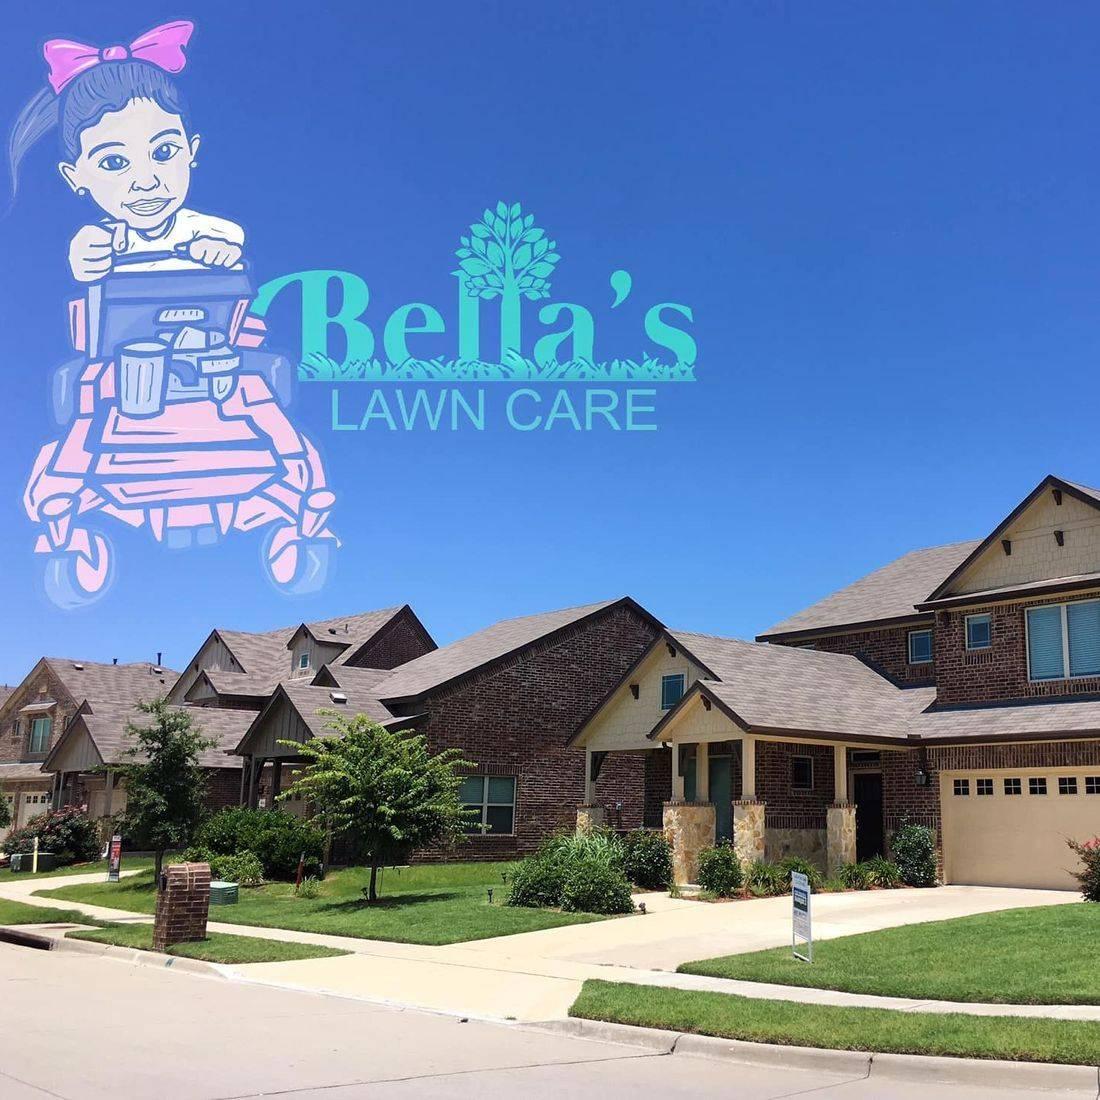 BELLAS LAWN CARE ROWLETT TEXAS 75089